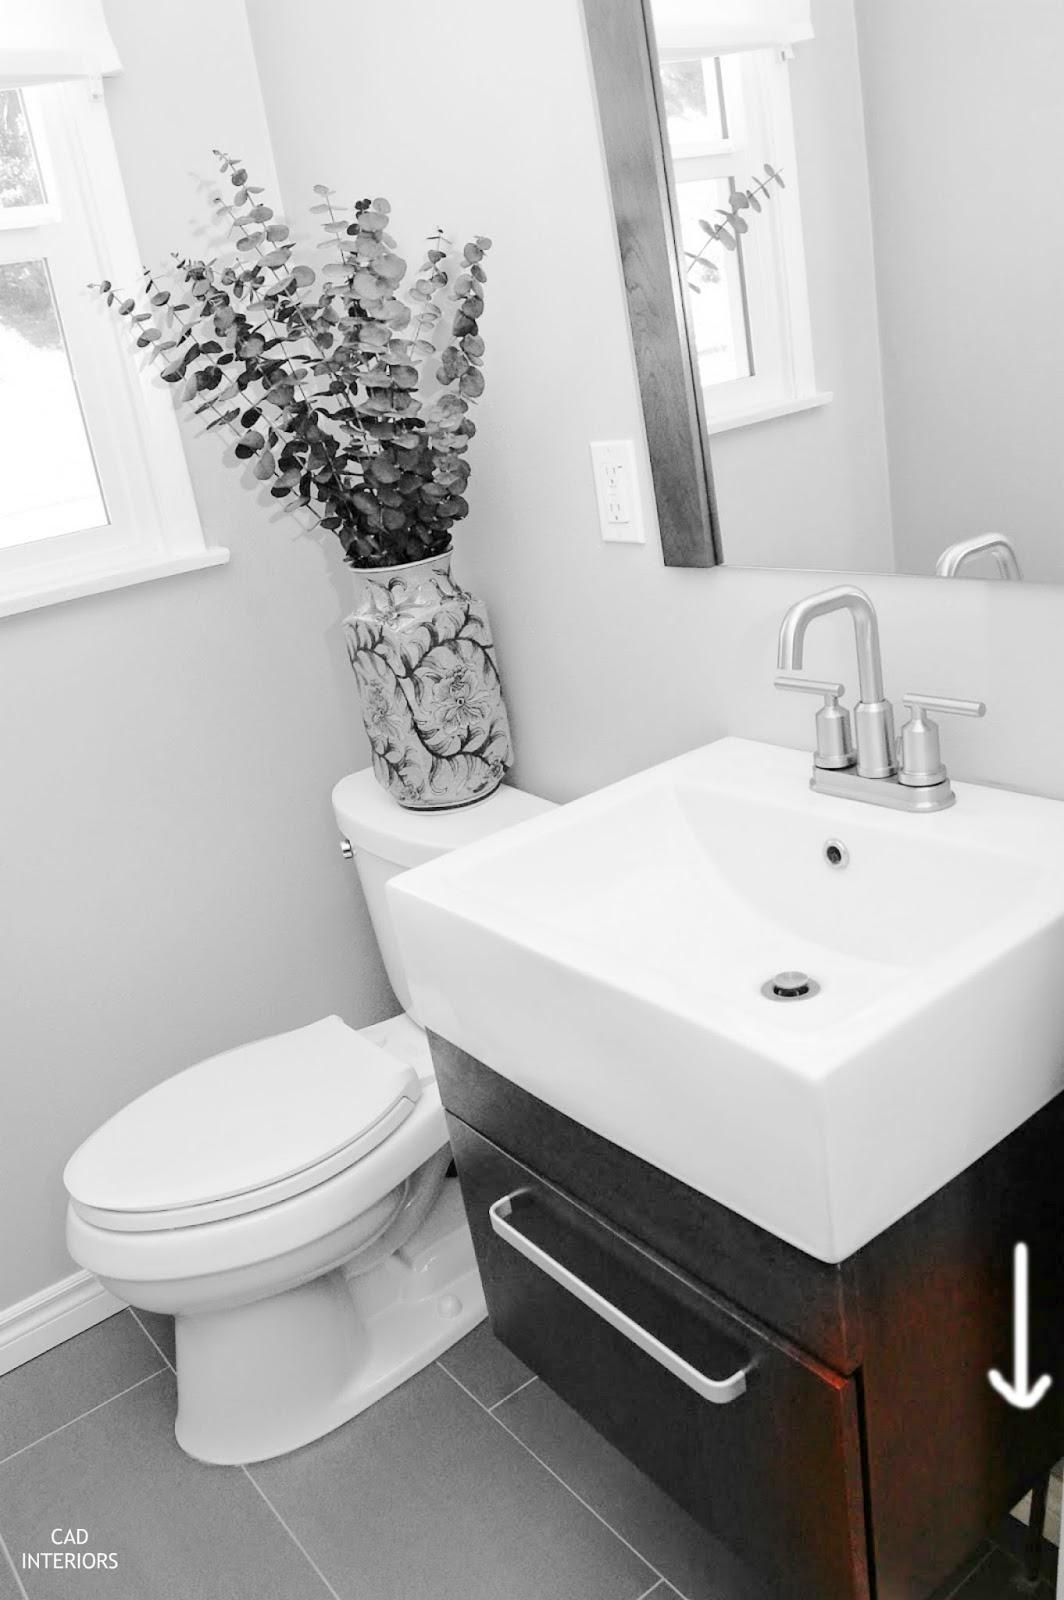 CAD INTERIORS guest bathroom renovation home improvement plumbing design tips interior design